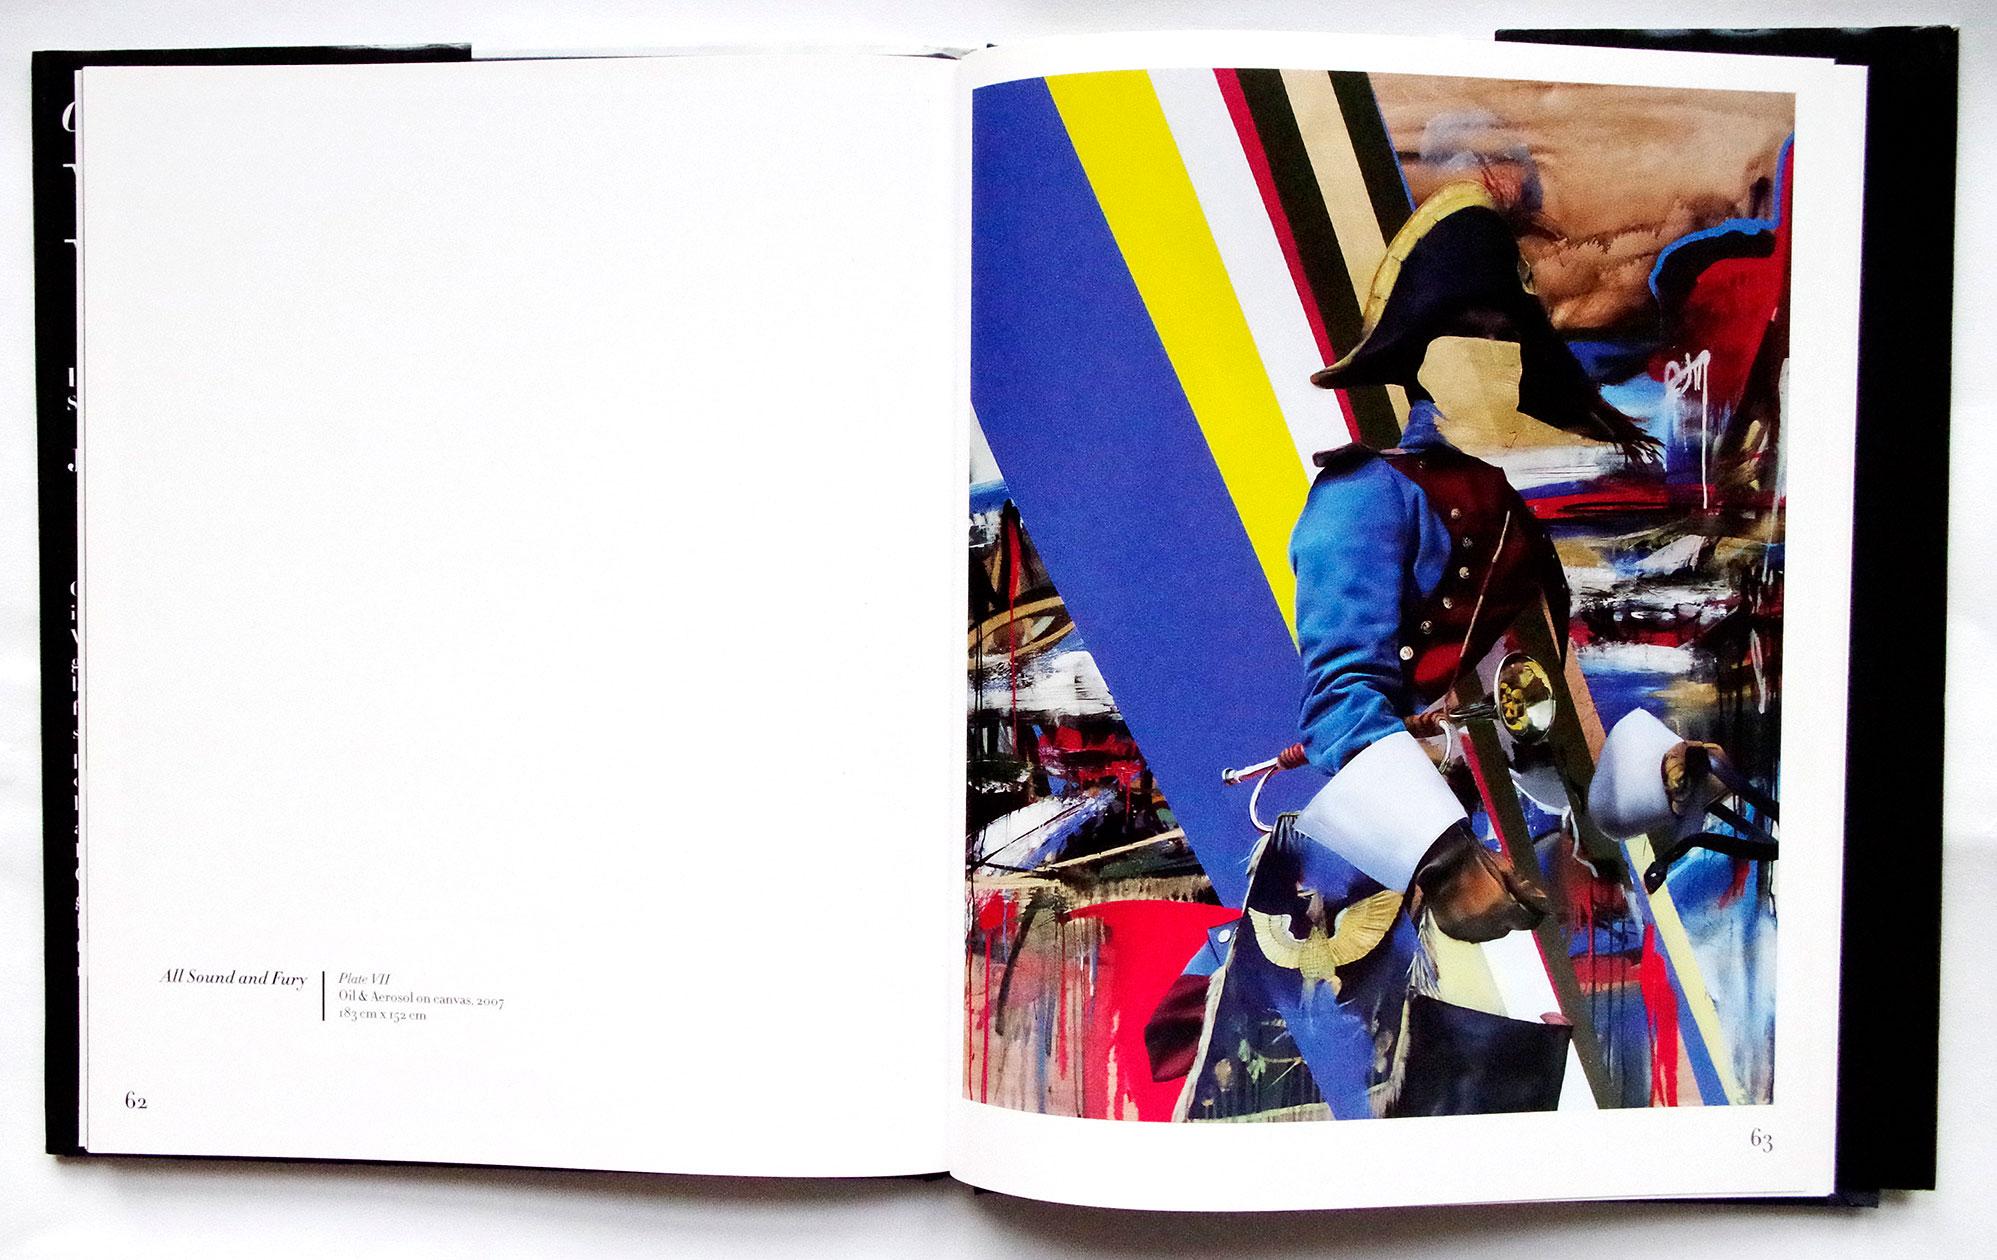 epm-print-management-bristol-art-books-6.jpg